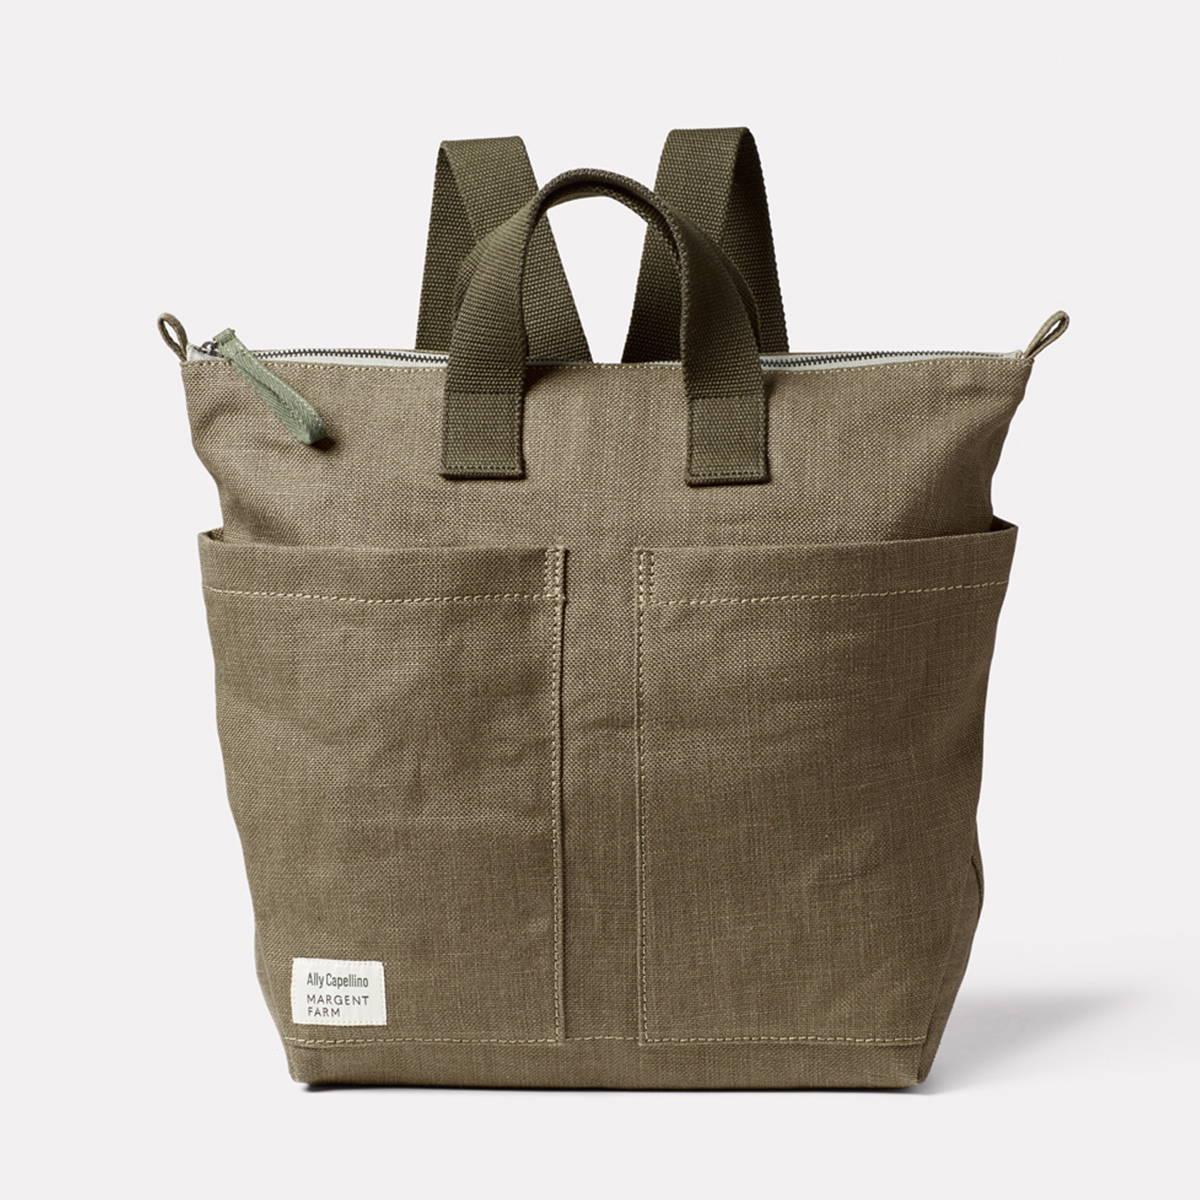 Ally Capellino X Margent Farm Hemp Backpack in Khaki